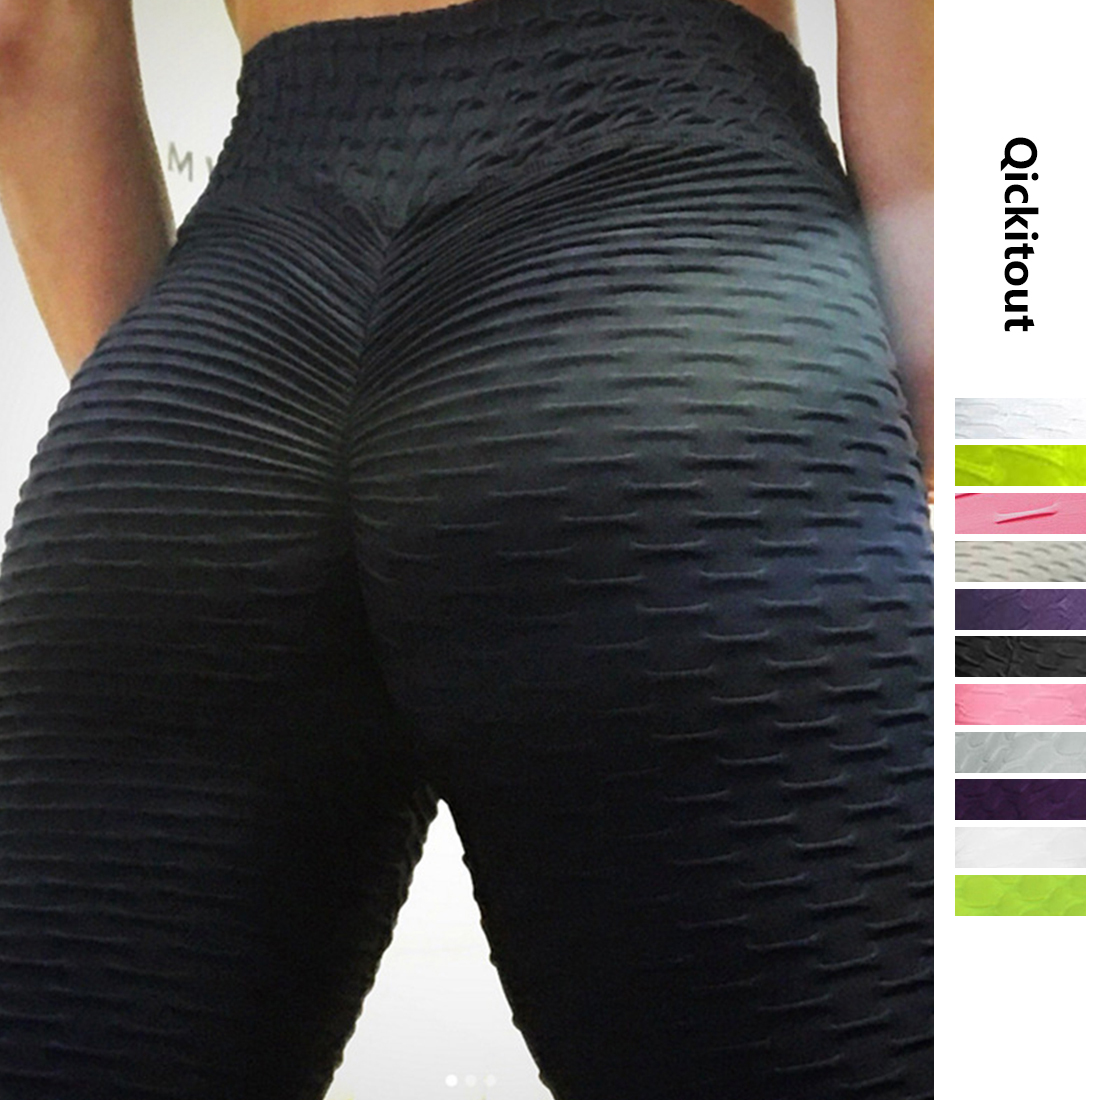 High Waist Fitness Leggings Women Workout Push Up Legging Fashion Solid Color Bodybuilding Jeggings Women Pants